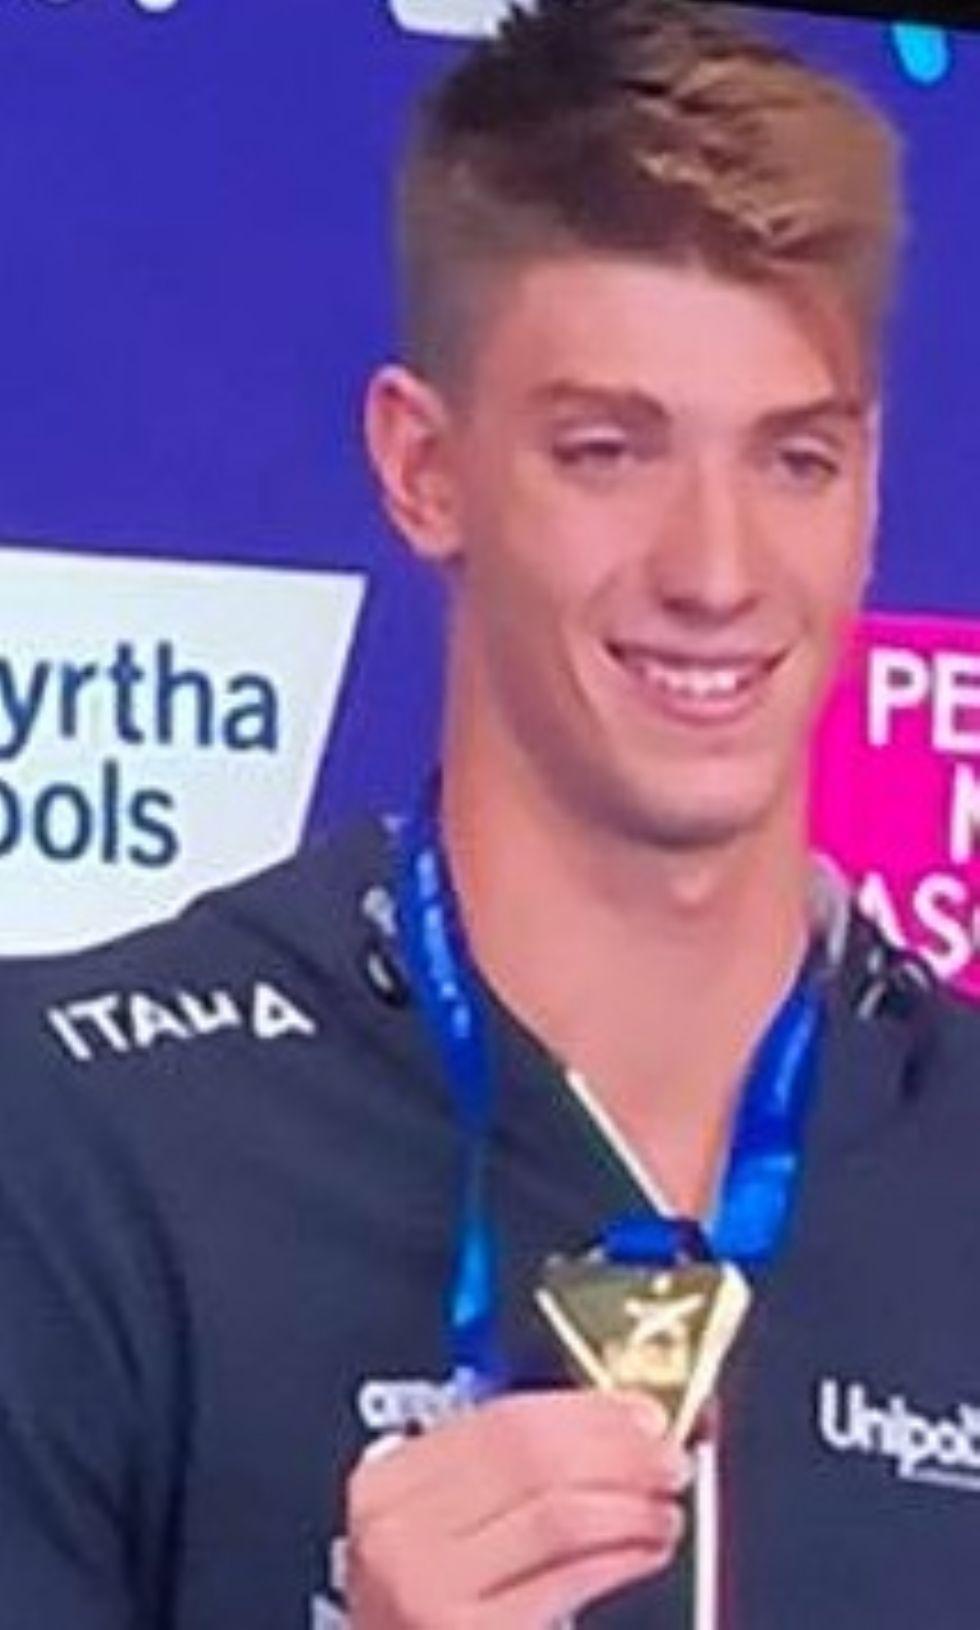 MONCALIERI - Alessandro Miressi oro agli europei di nuoto